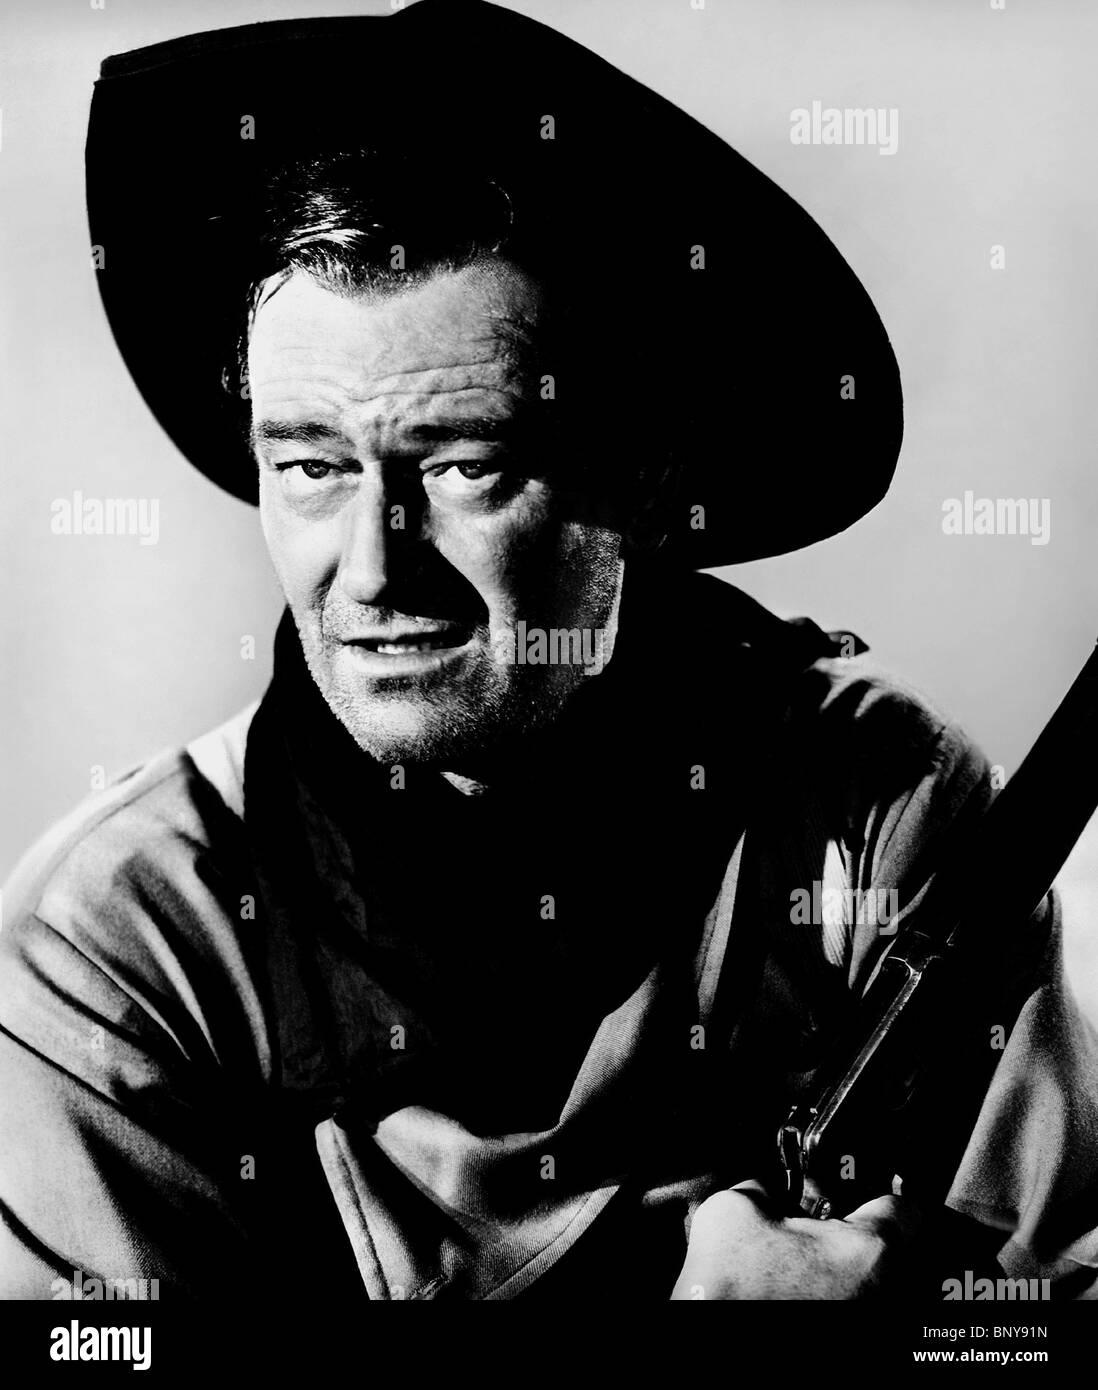 JOHN WAYNE THE SEARCHERS (1956) - Stock Image